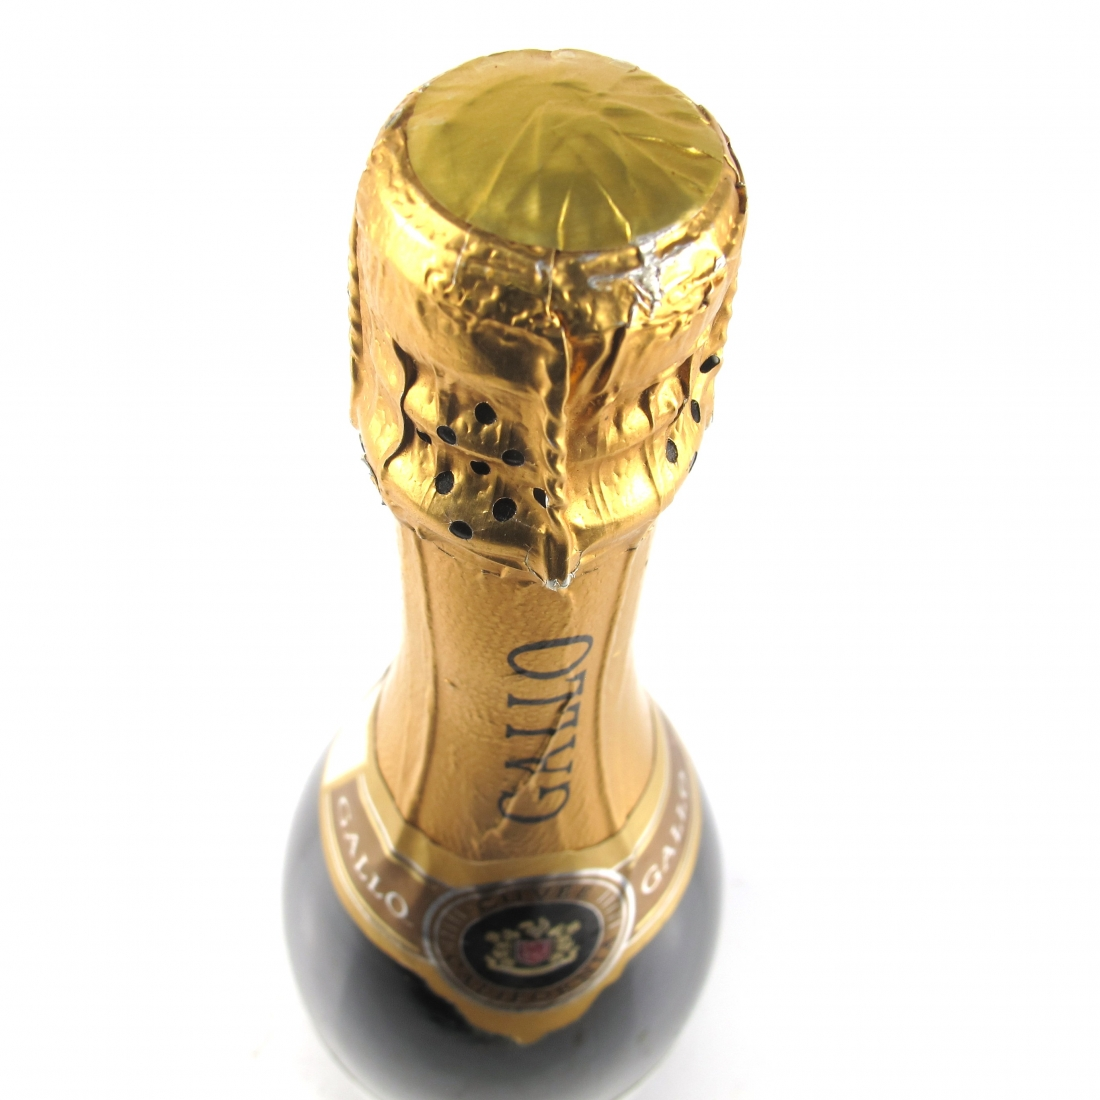 Gallo NV Californian Sparkling Wine